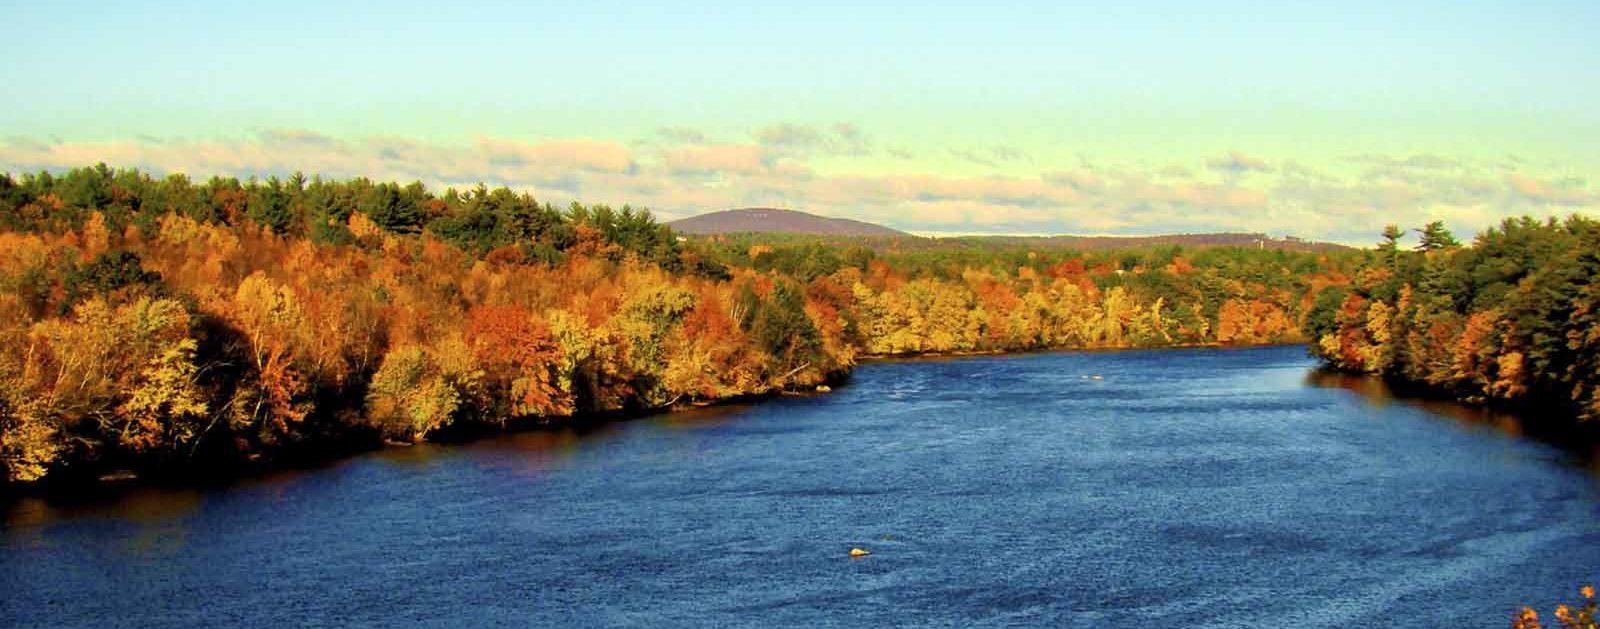 Merrimack River | Merrimack River Watershed Council